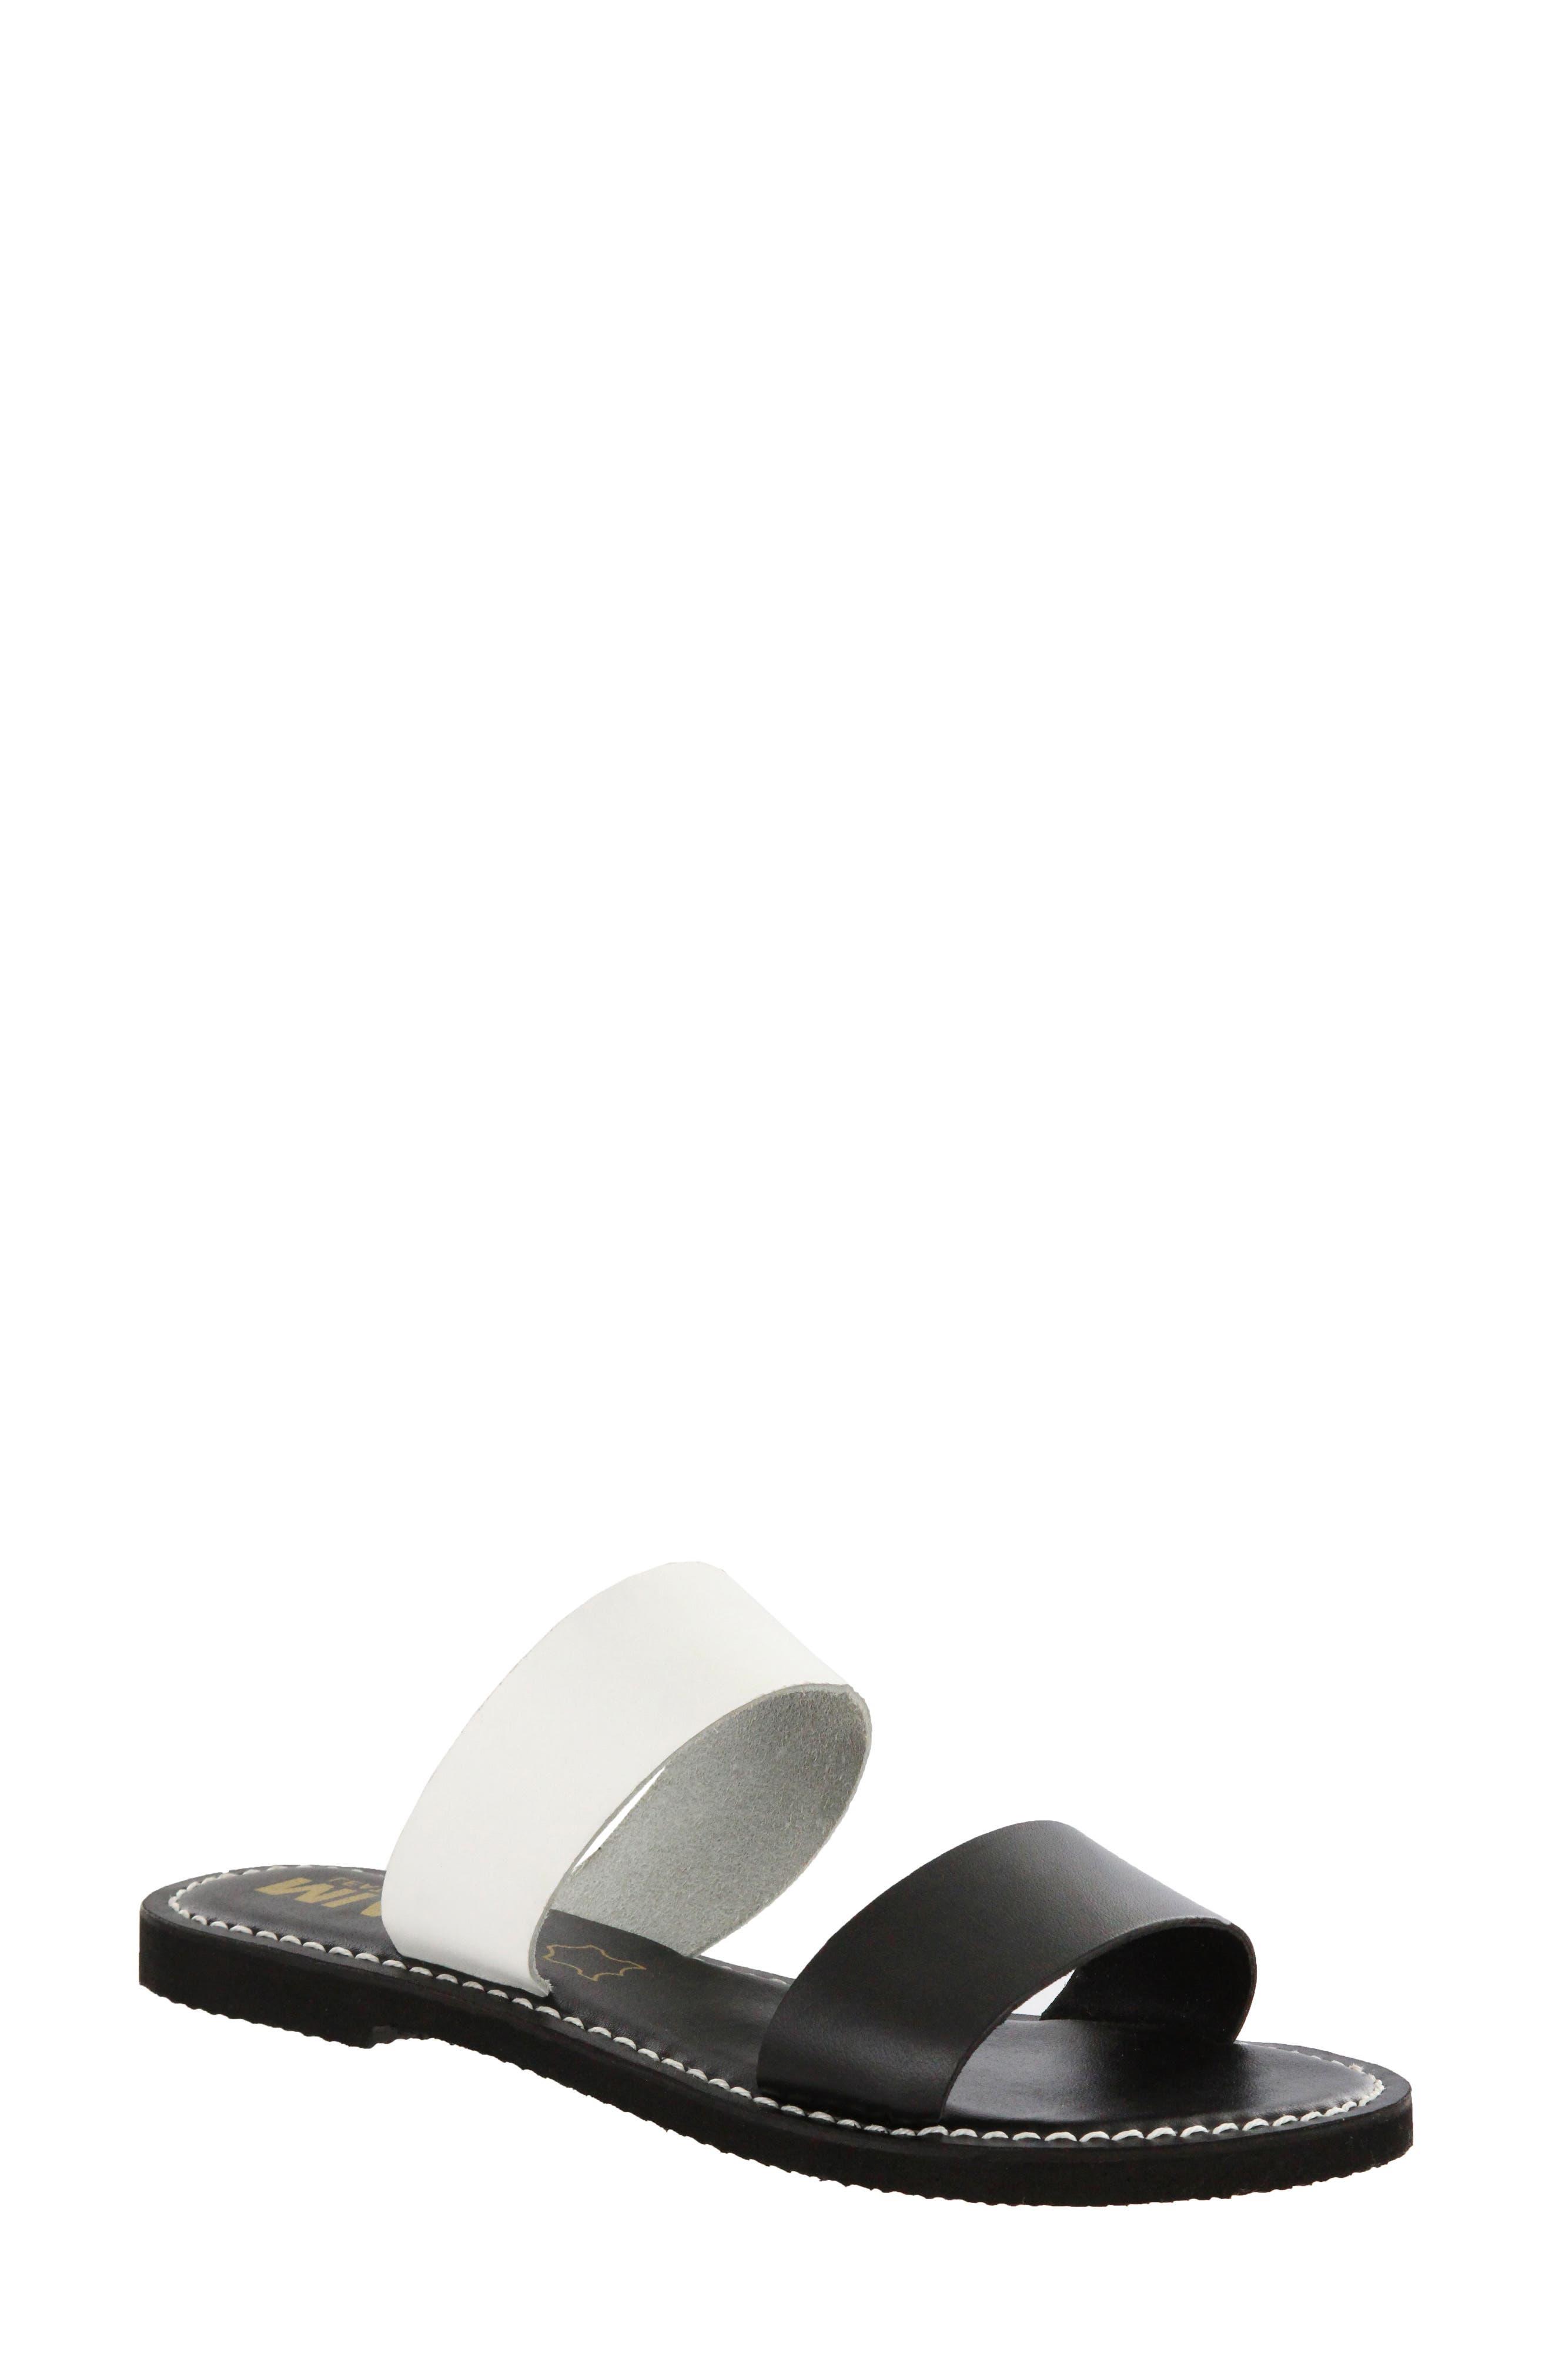 Main Image - MIA Nila Two-Band Slide Sandal (Women)